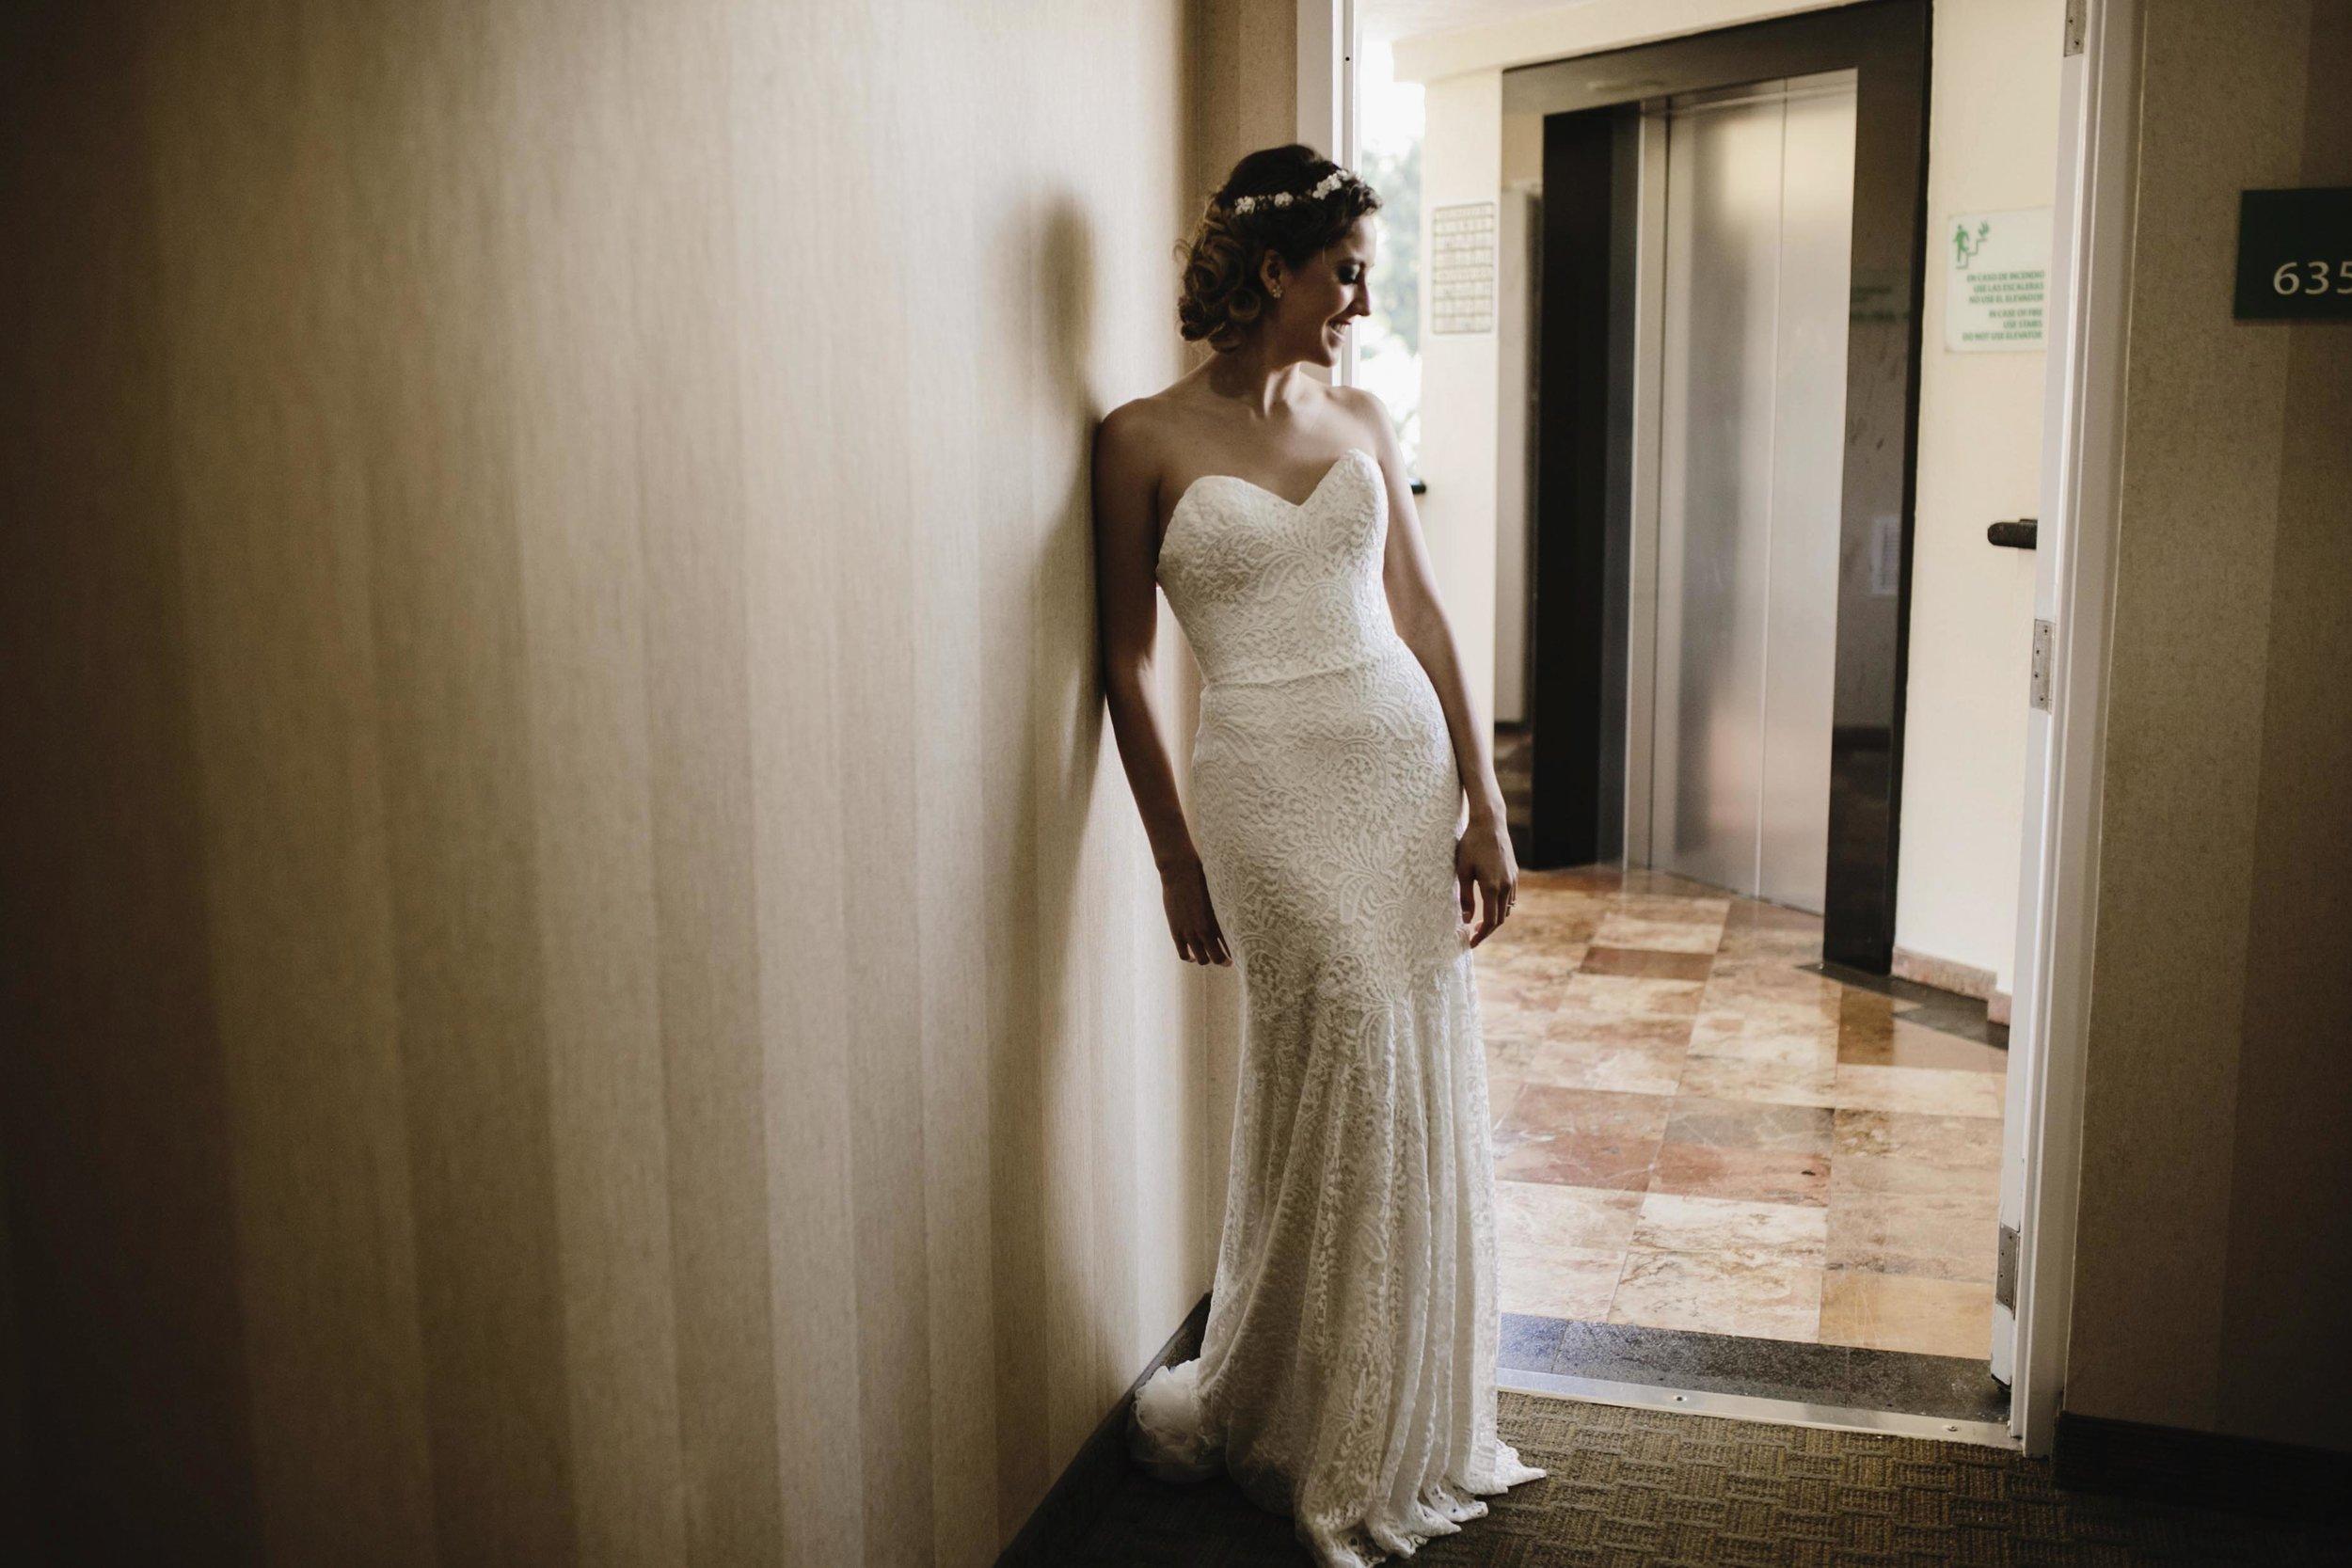 alfonso_flores_destination_wedding_photography_jardin_amarello_cuernavaca42.jpg